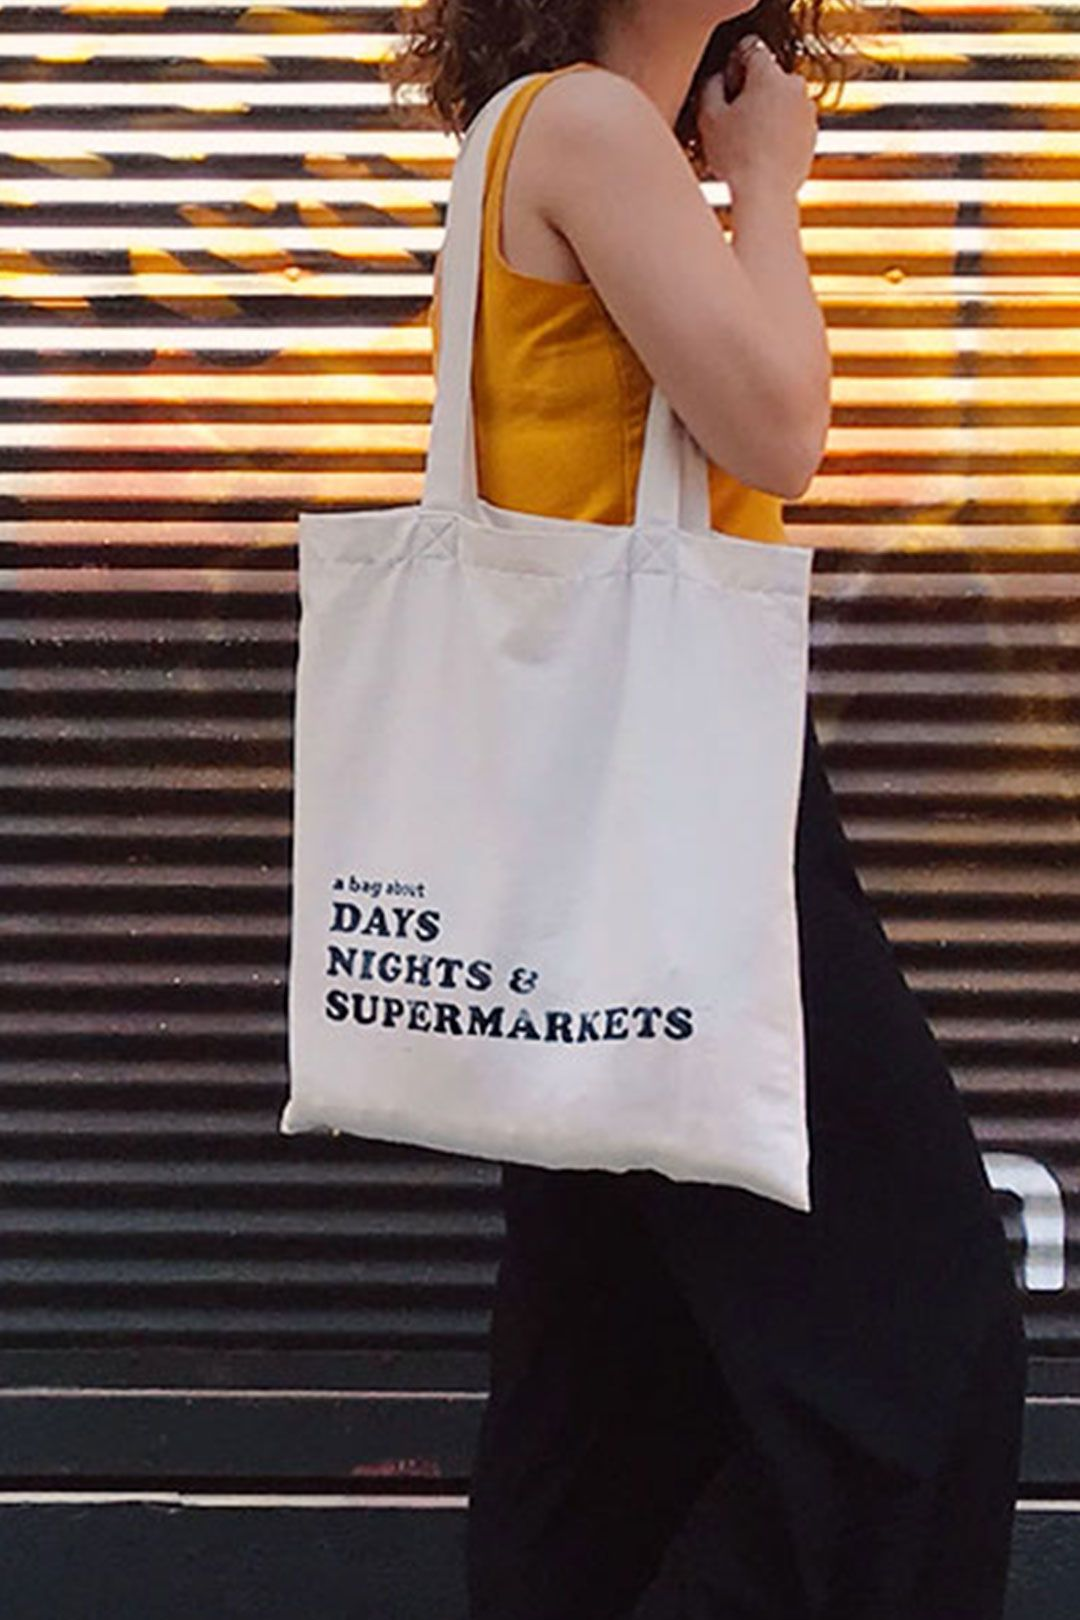 Supermarkets Handmade Canvas Tote Bag with original